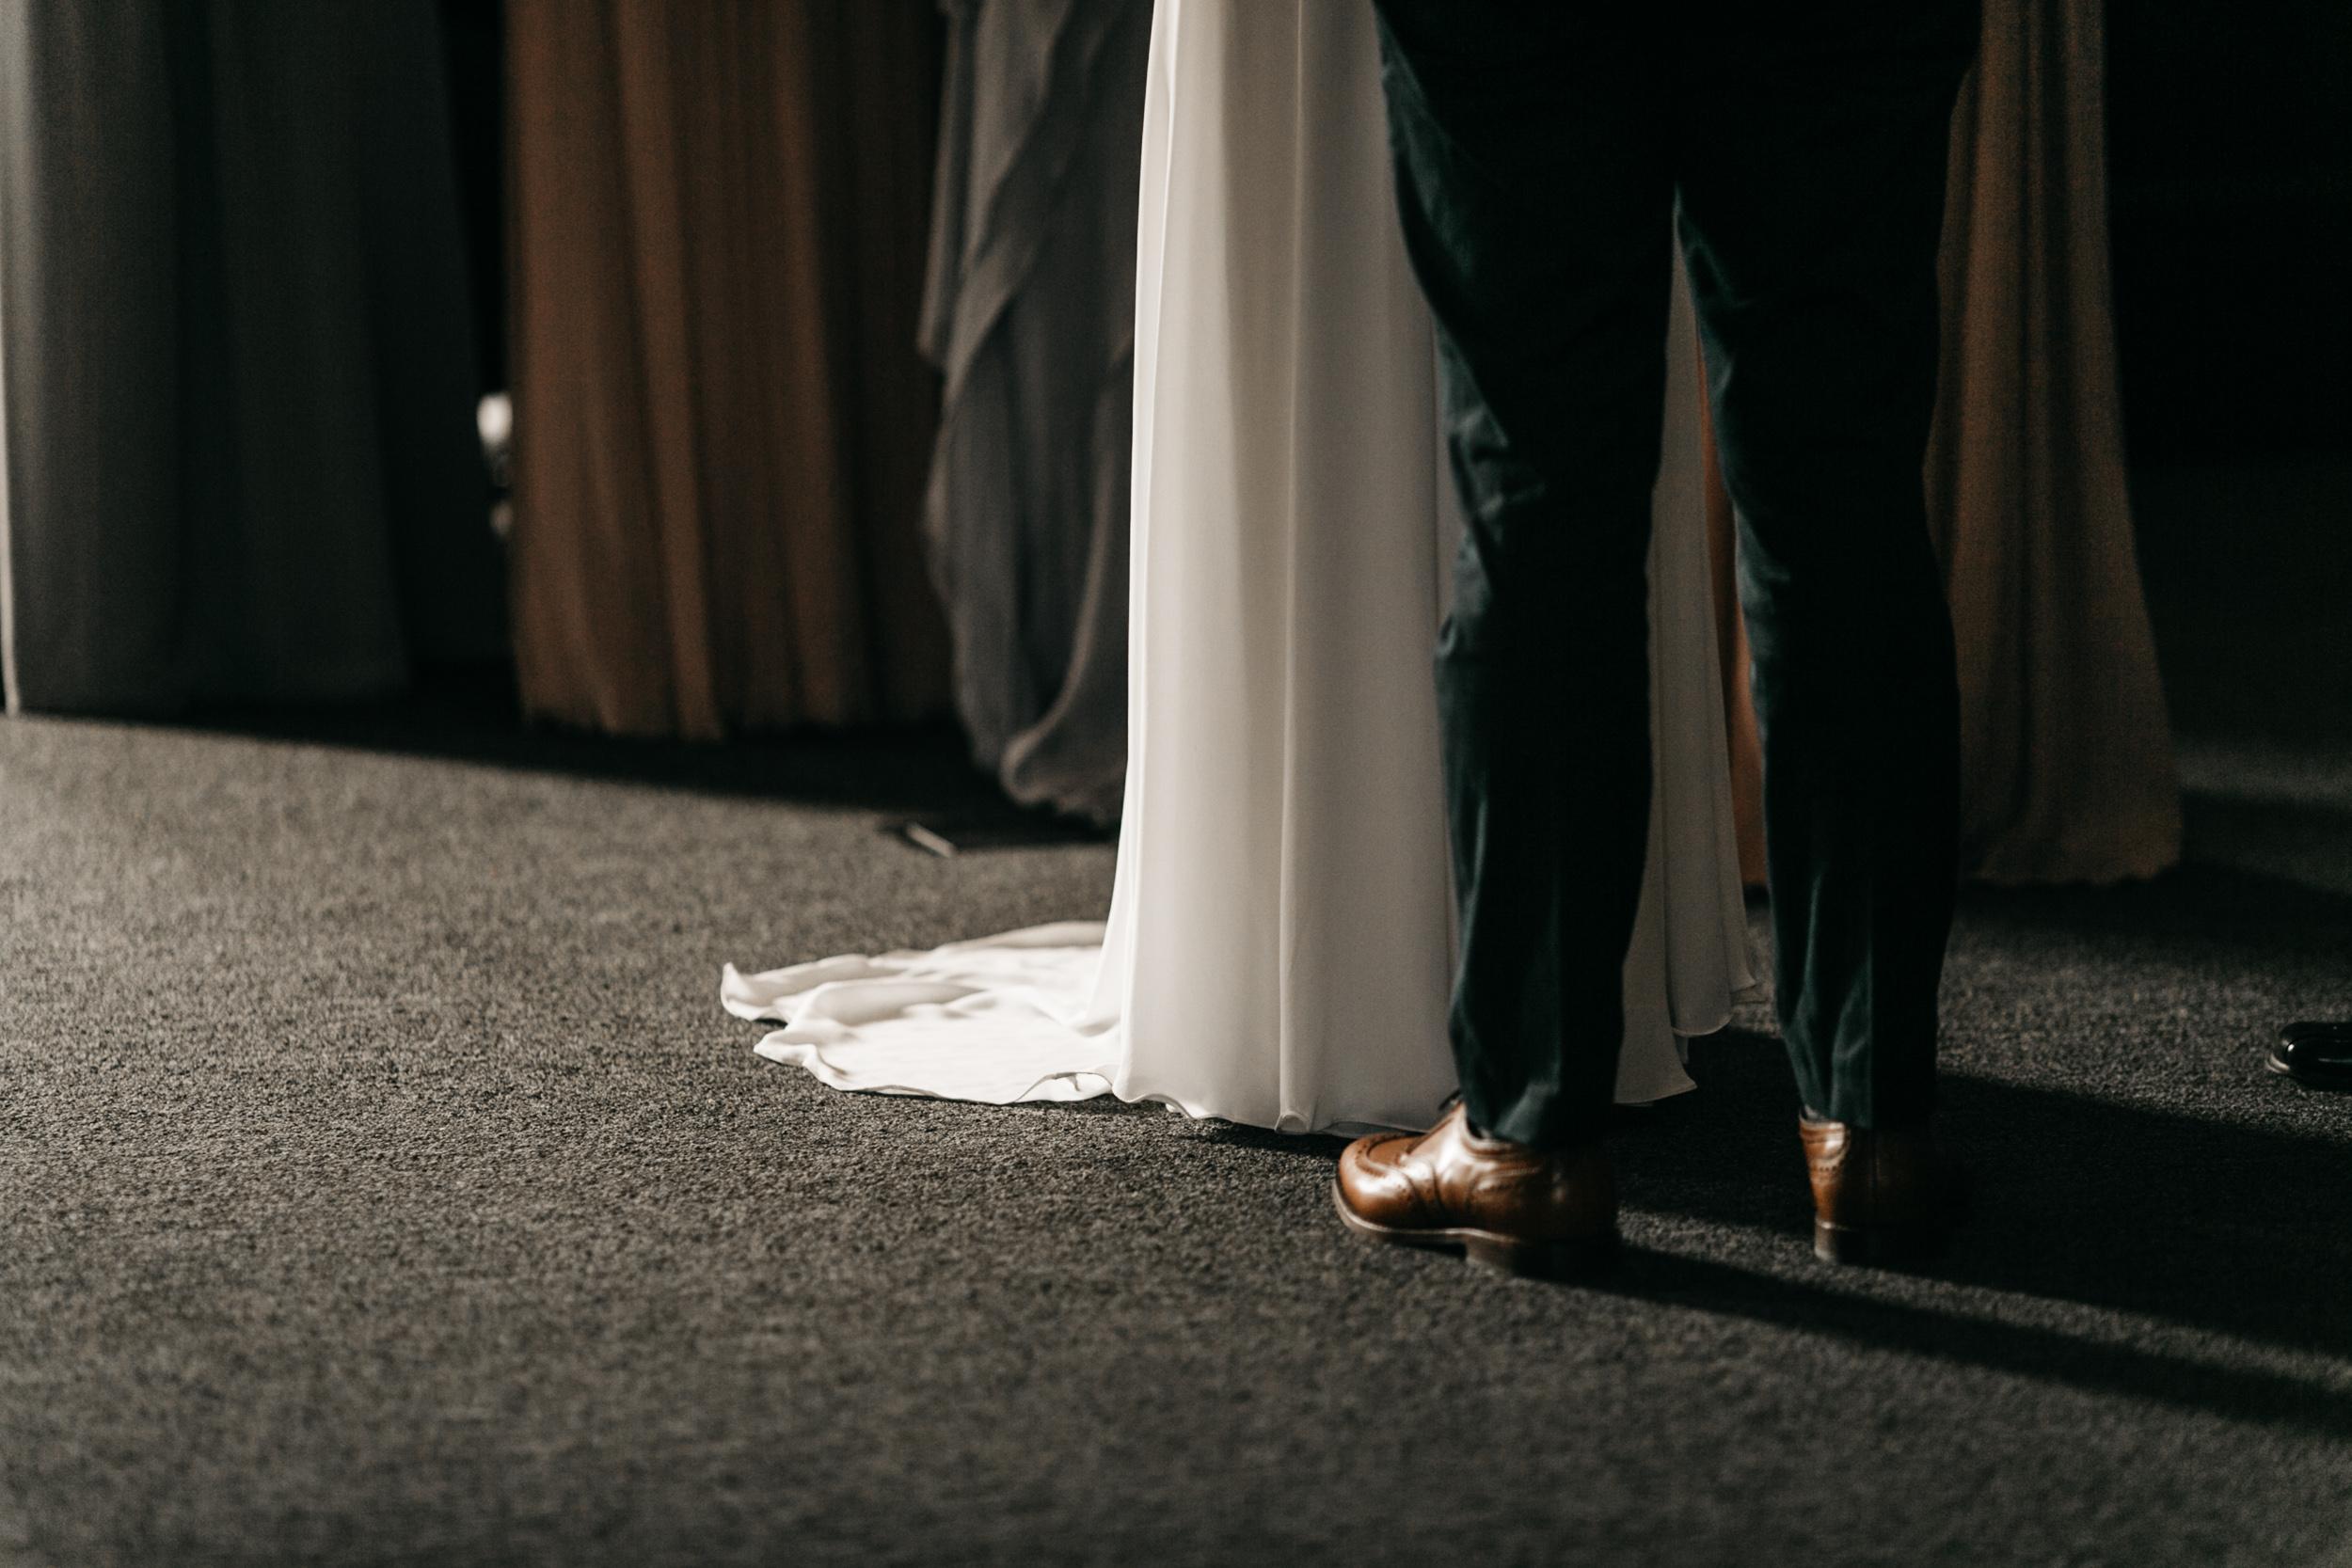 Intimate Portland Oregon wedding photographed by Jess Hunter, stylish air bnb in Portland for bride getting ready, Door of Hope wedding in Portland, Sarah Seven wedding dress, Anthropologie wedding, emotional wedding day moments